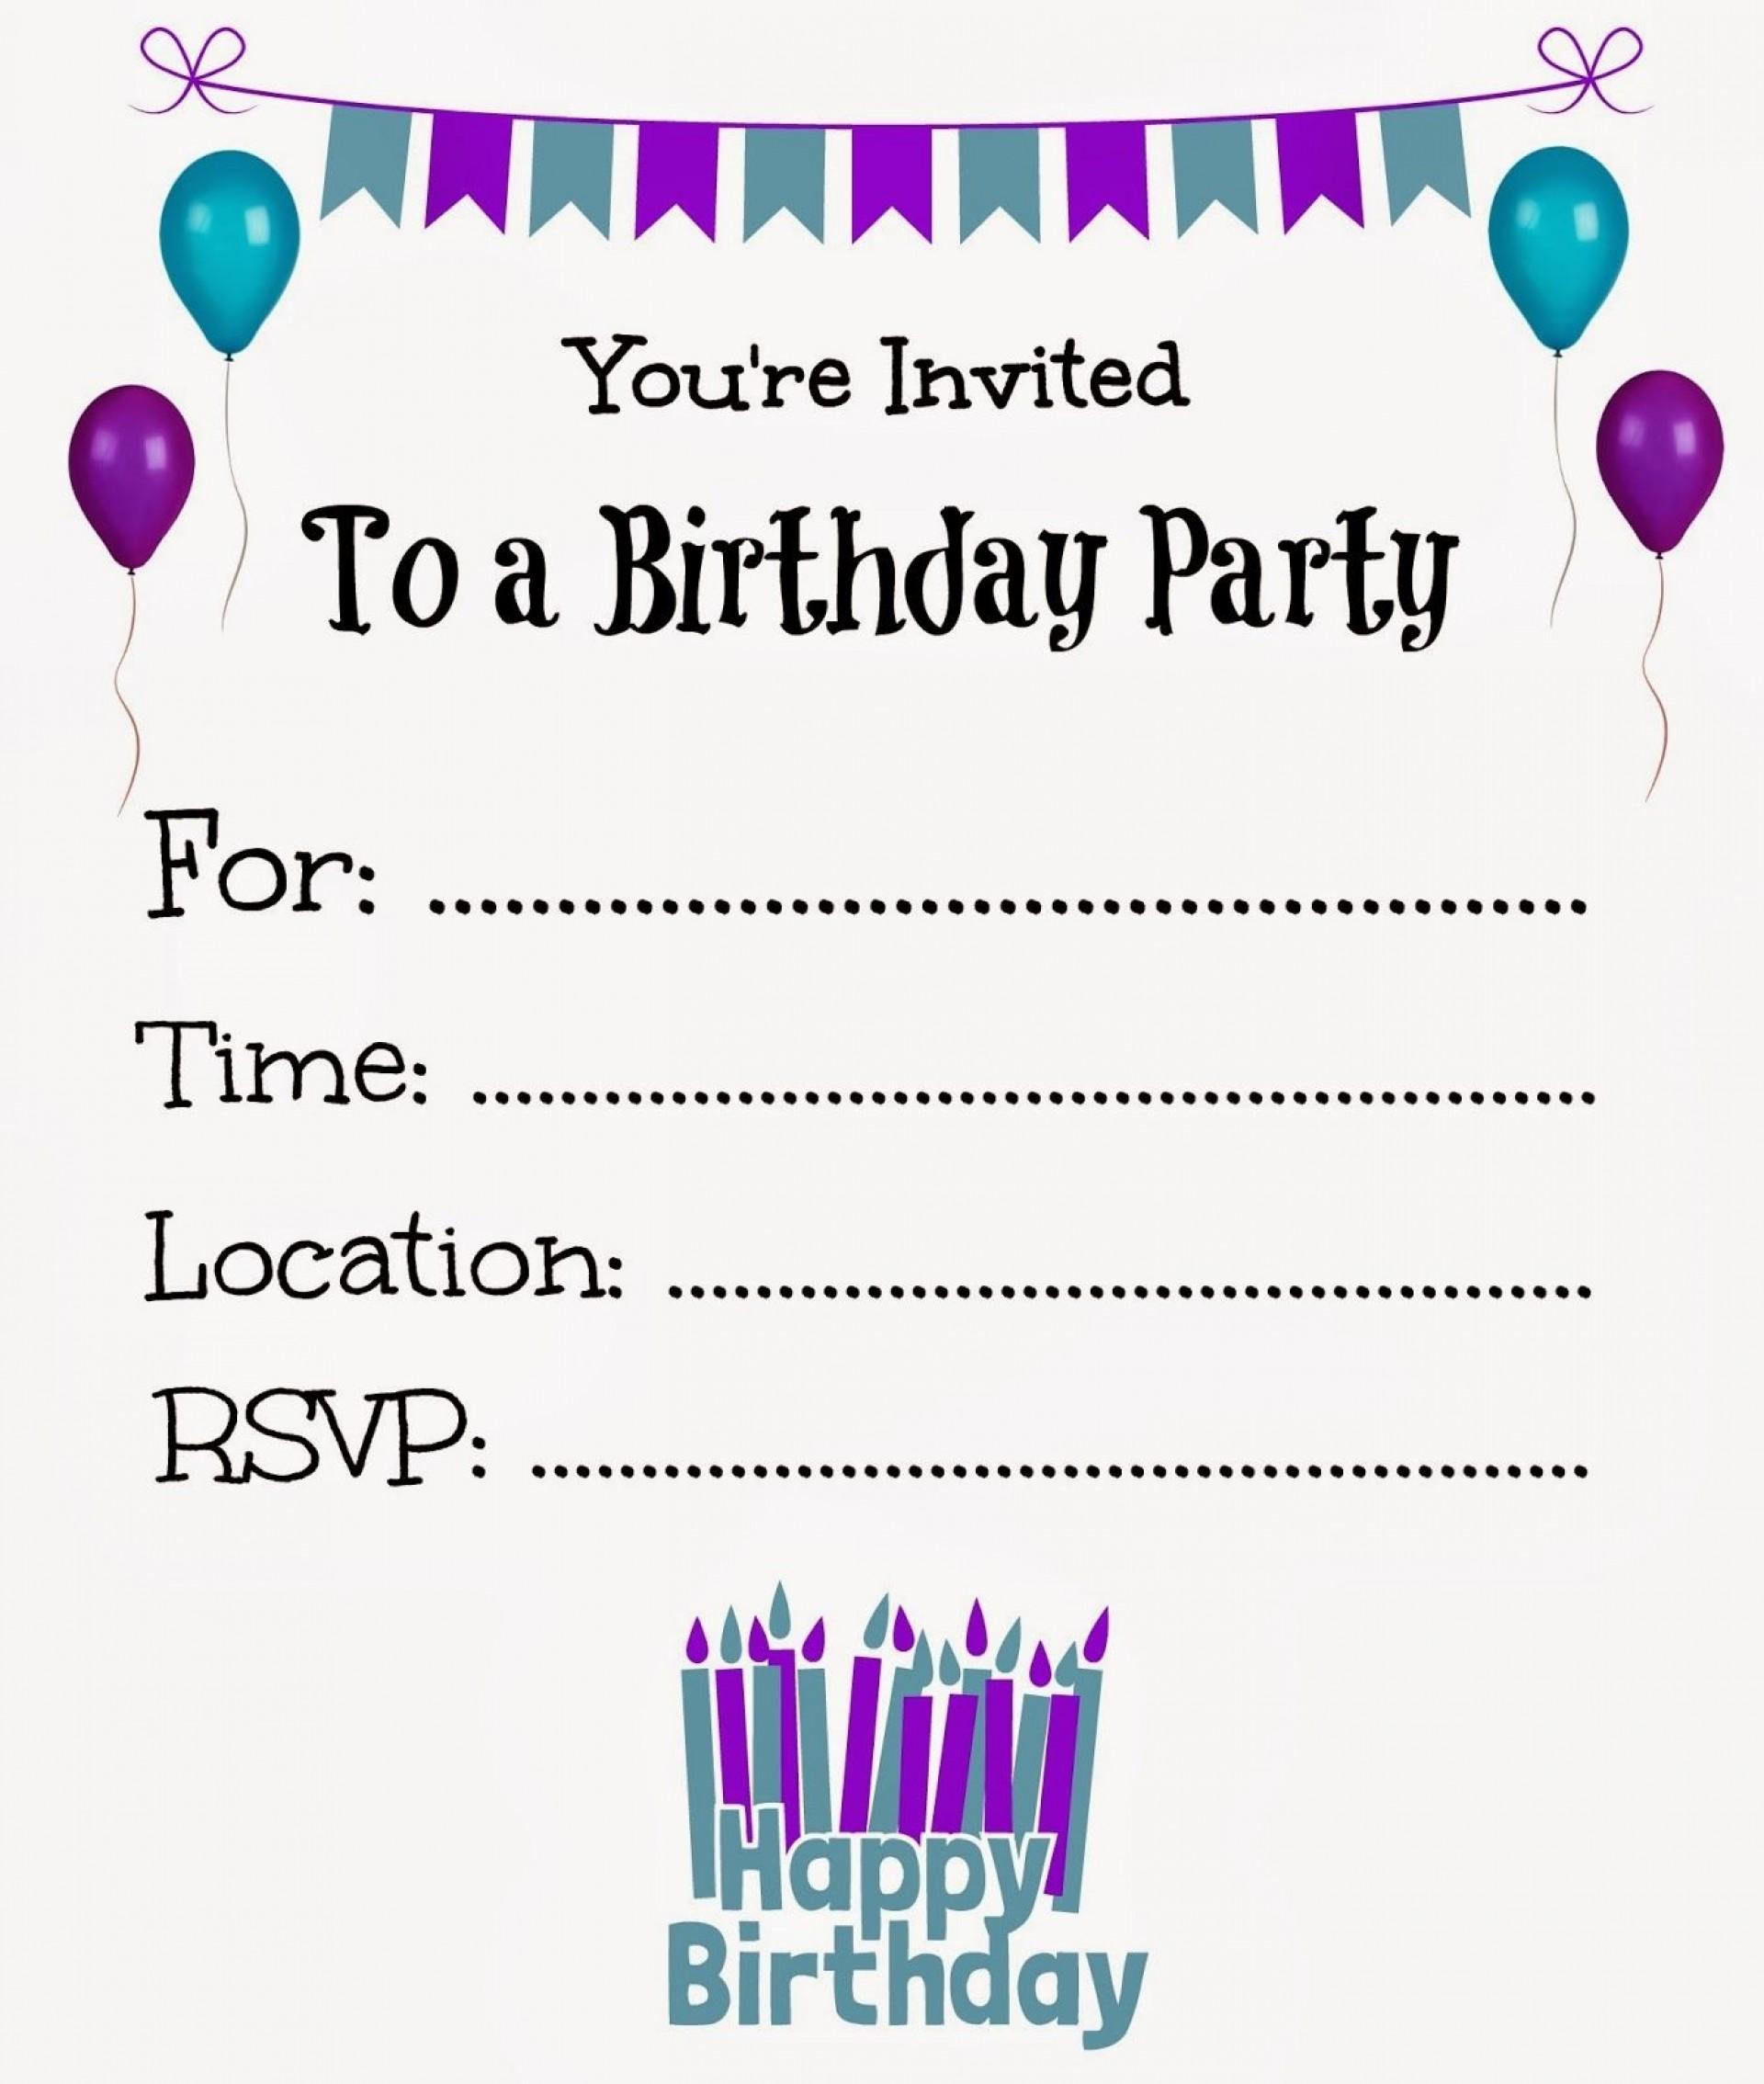 008 Stunning Free Printable Party Invitation Template Design  Templates Beach Spa Tea1920